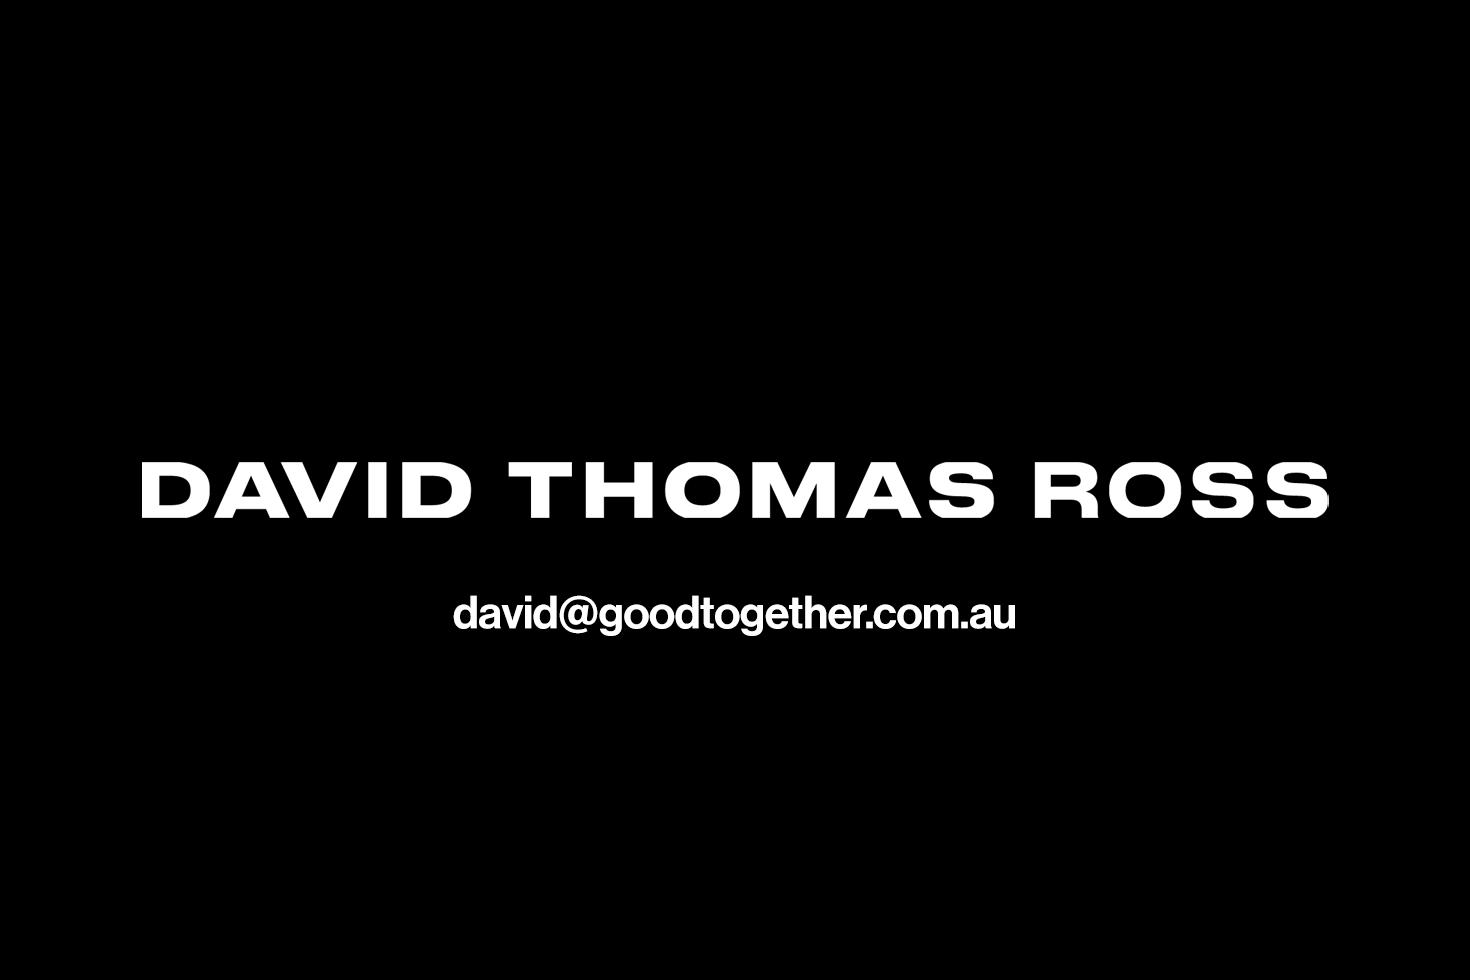 DAVID THOMAS ROSS